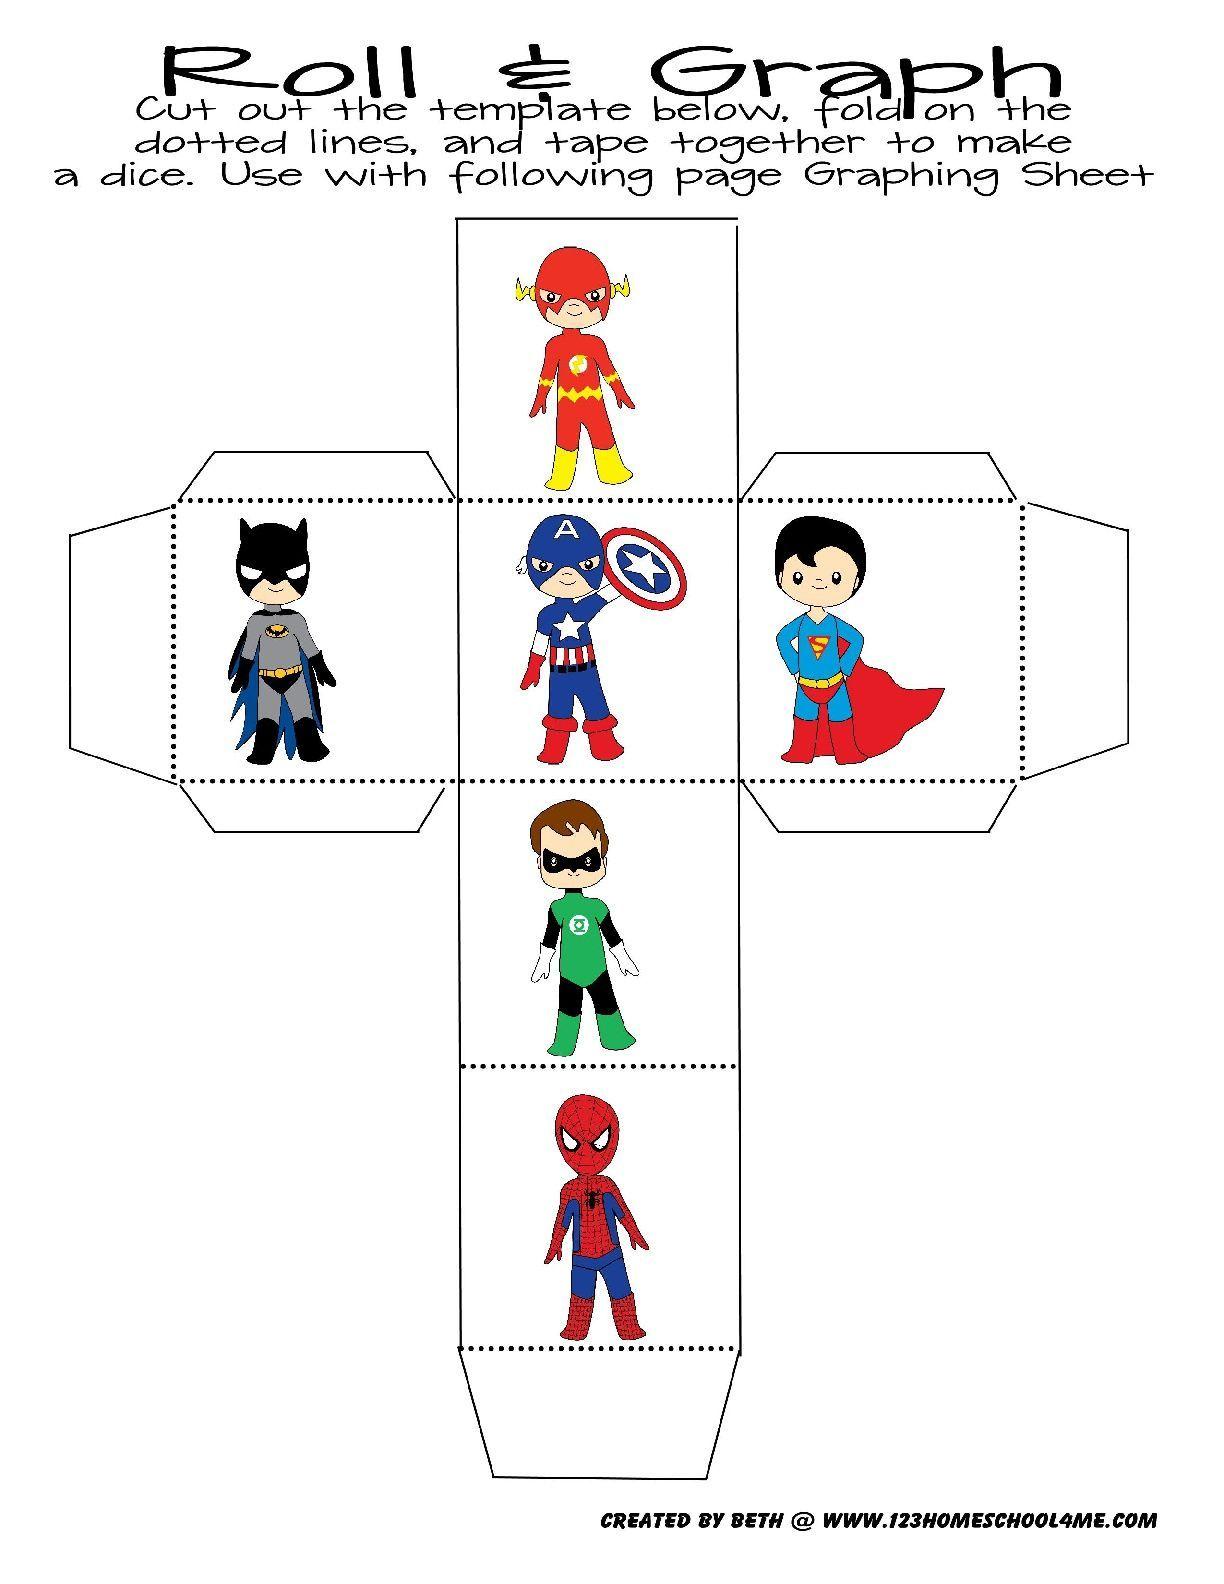 Pin By Shae Kimble On Classroom Superhero Worksheets For Kids Superhero Math Activities Superhero Math Worksheets For Kids [ 1584 x 1224 Pixel ]